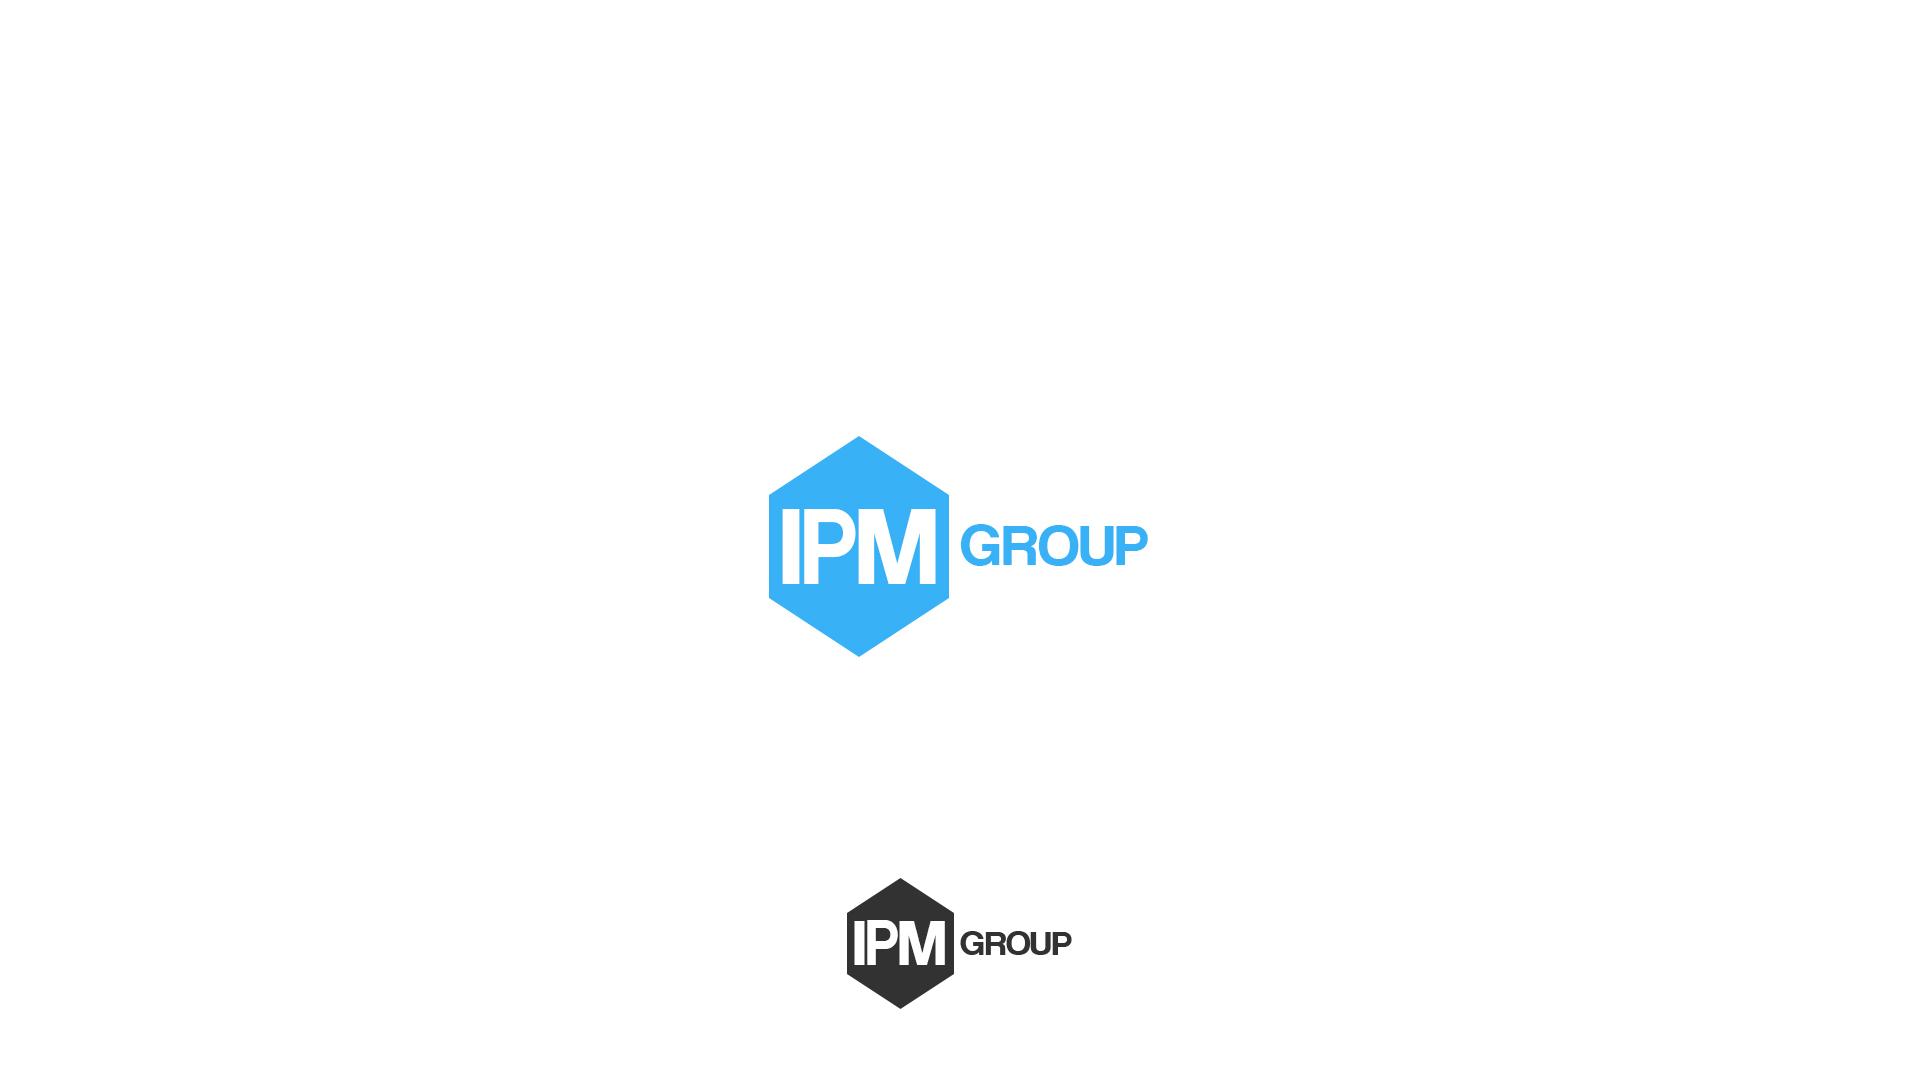 Разработка логотипа для управляющей компании фото f_0355f860d5285644.jpg